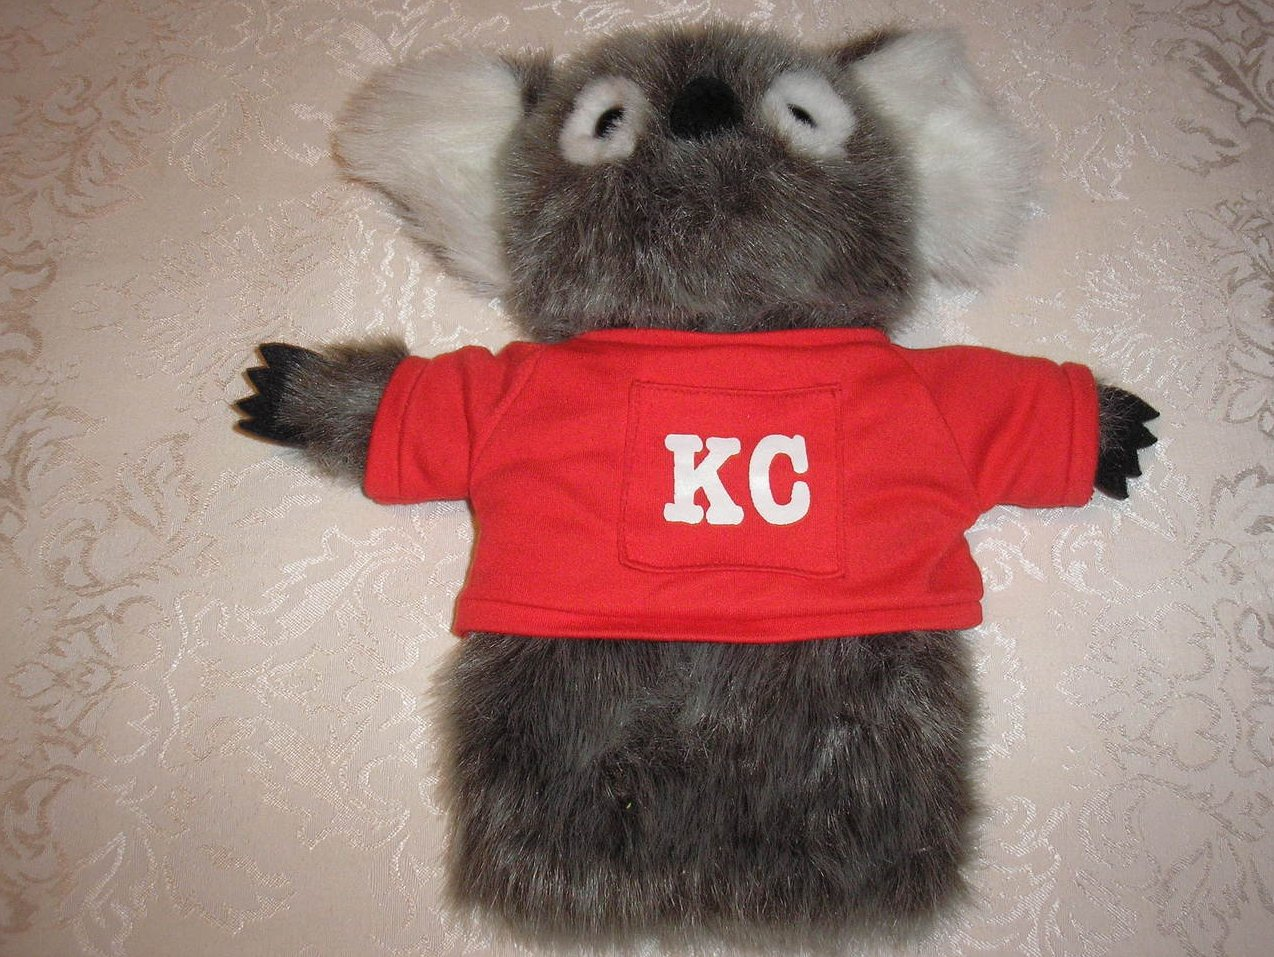 Plush Koala Hand Puppet 11 x 11 inches like new condition